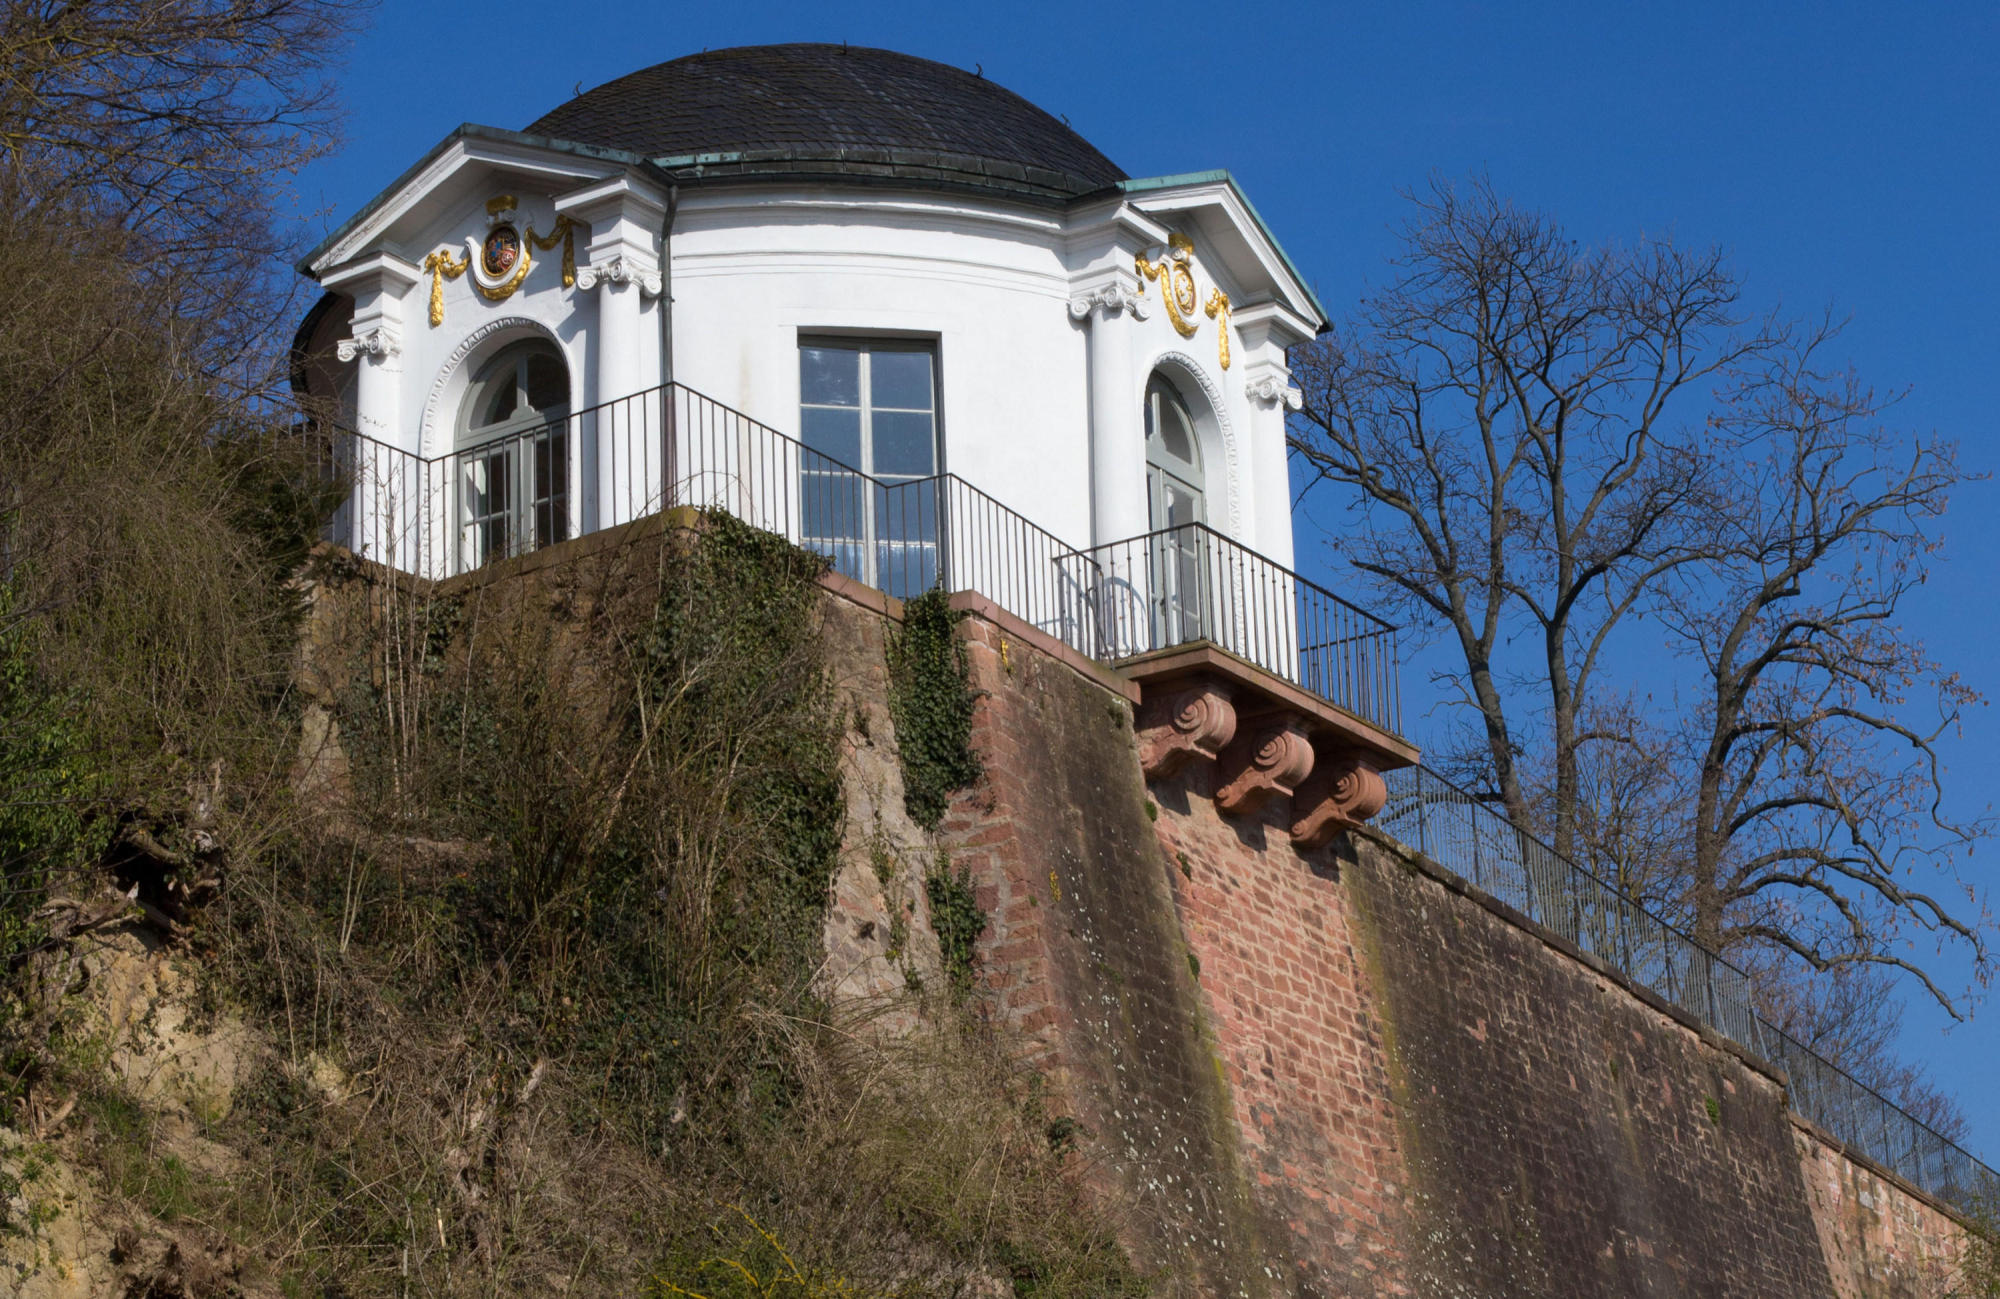 https://www.fr.de/panorama/leute/gelassen-auge-sturms ...